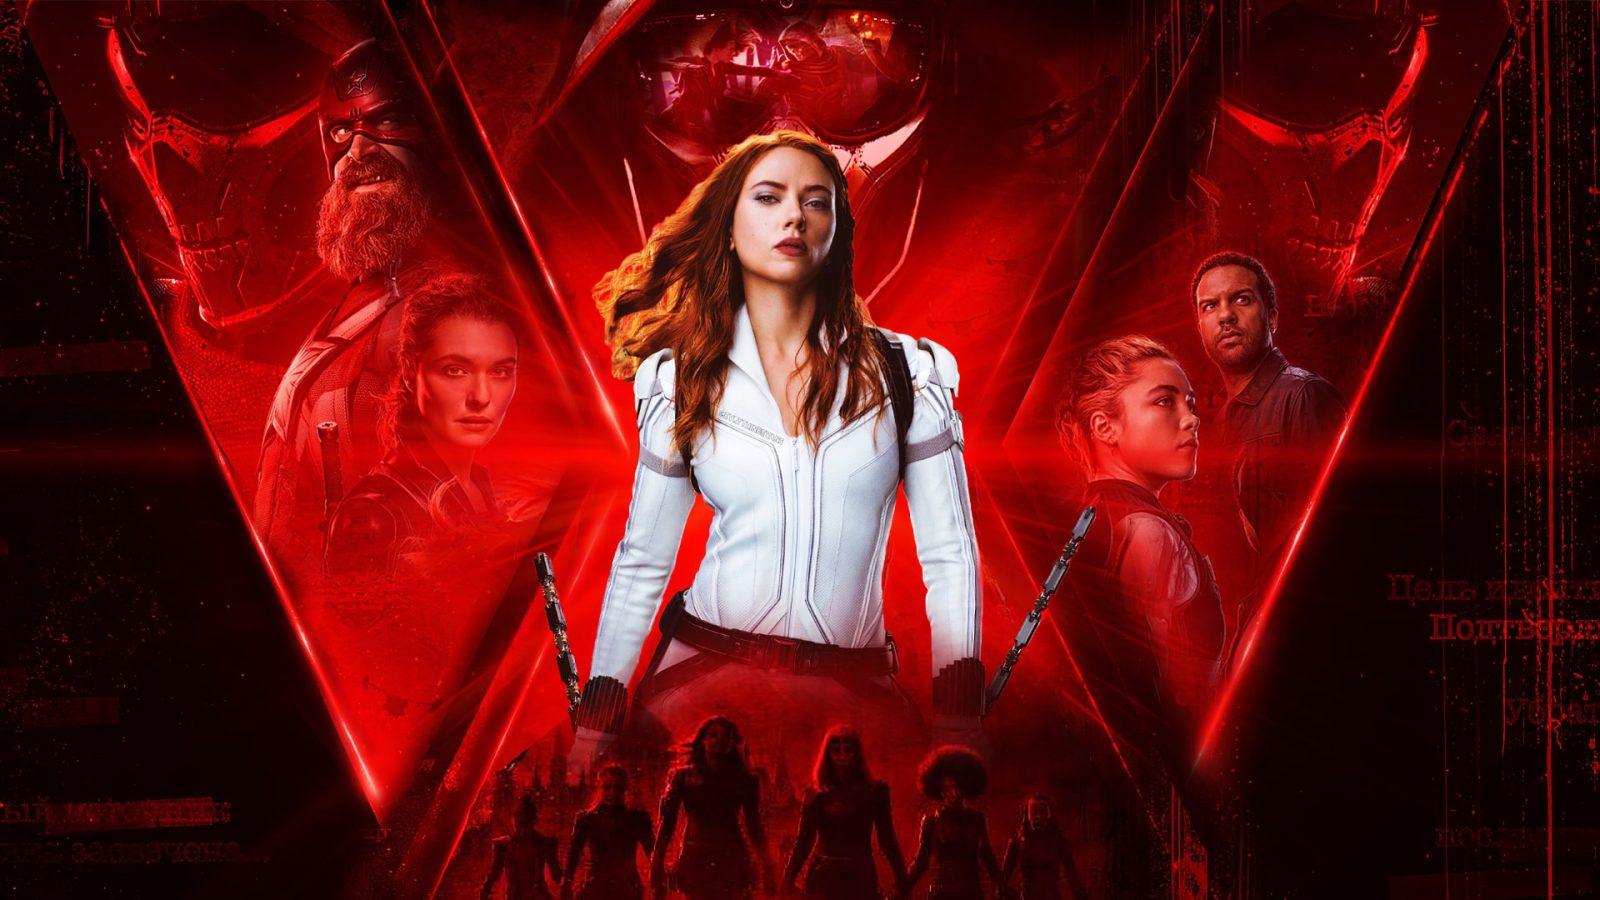 Black Widow (2021) – The worst MCU film ever made